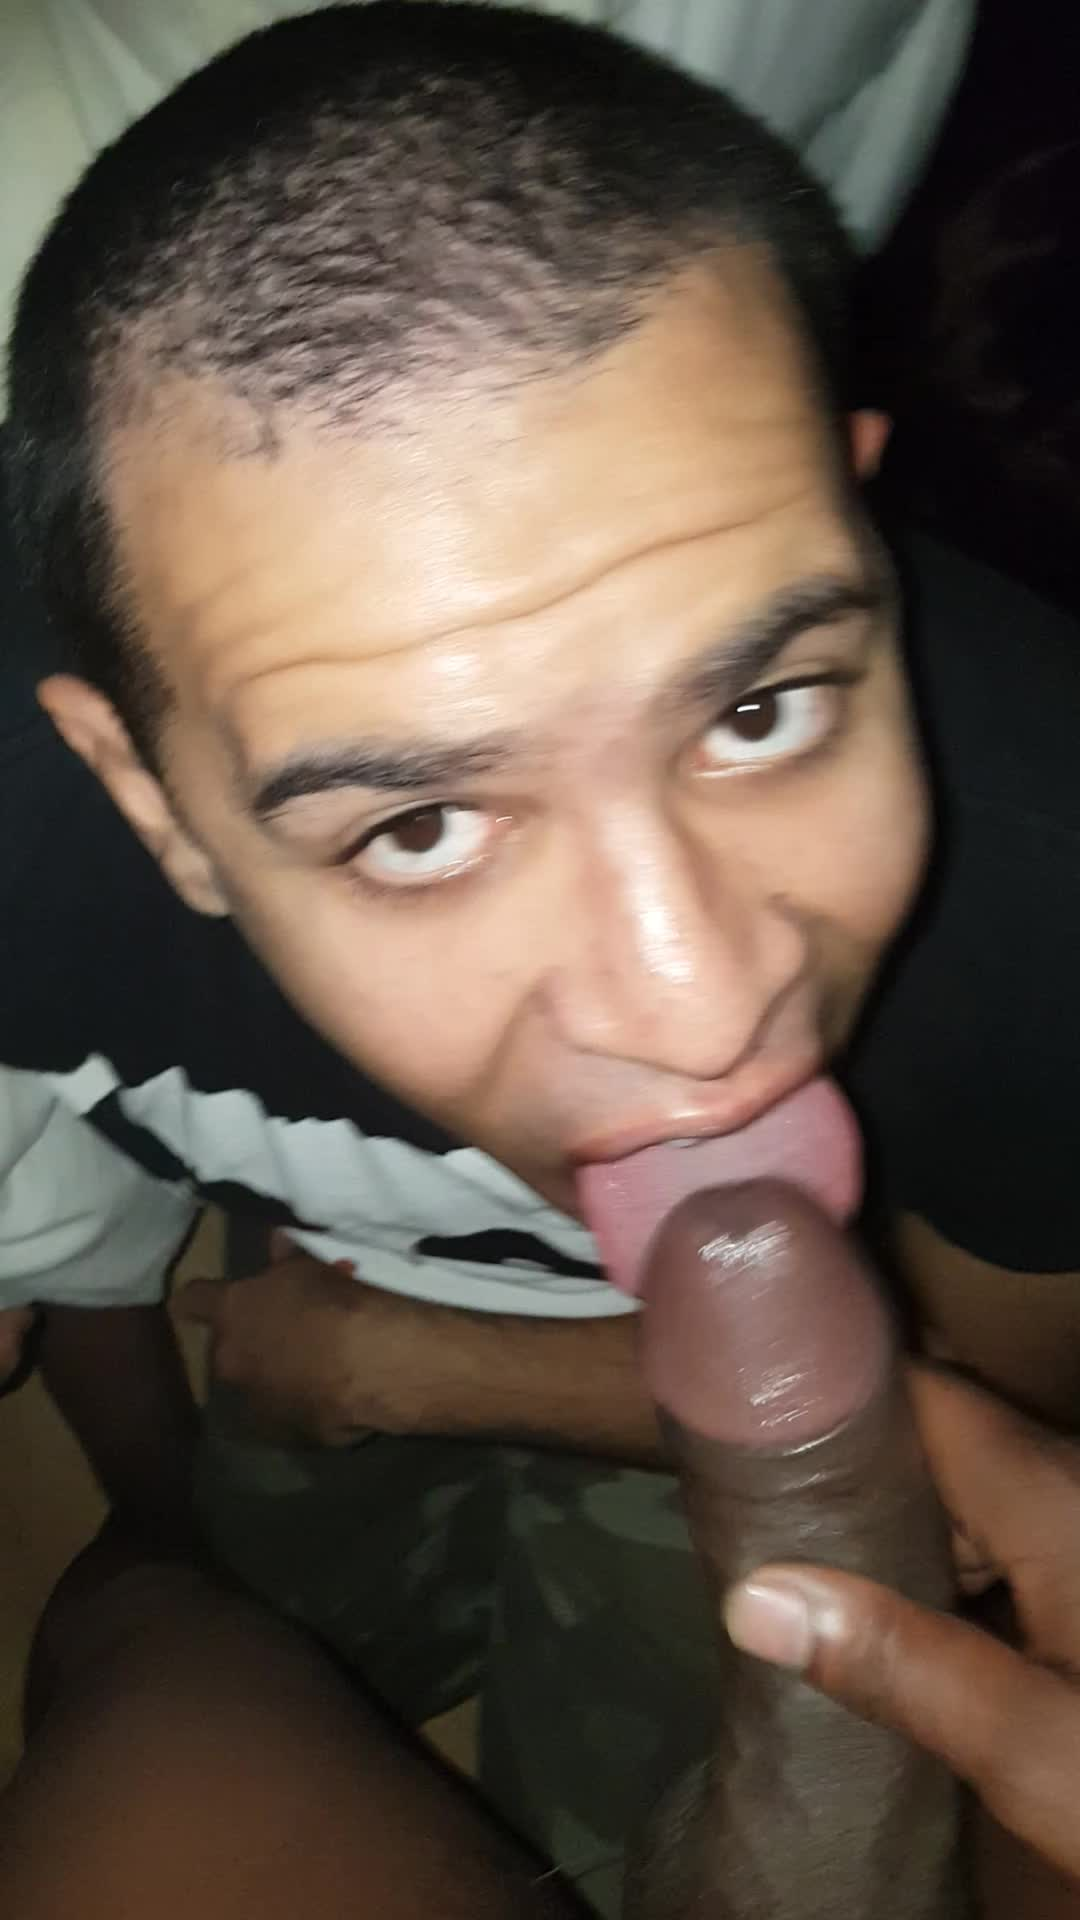 Melvin Cara'd vid